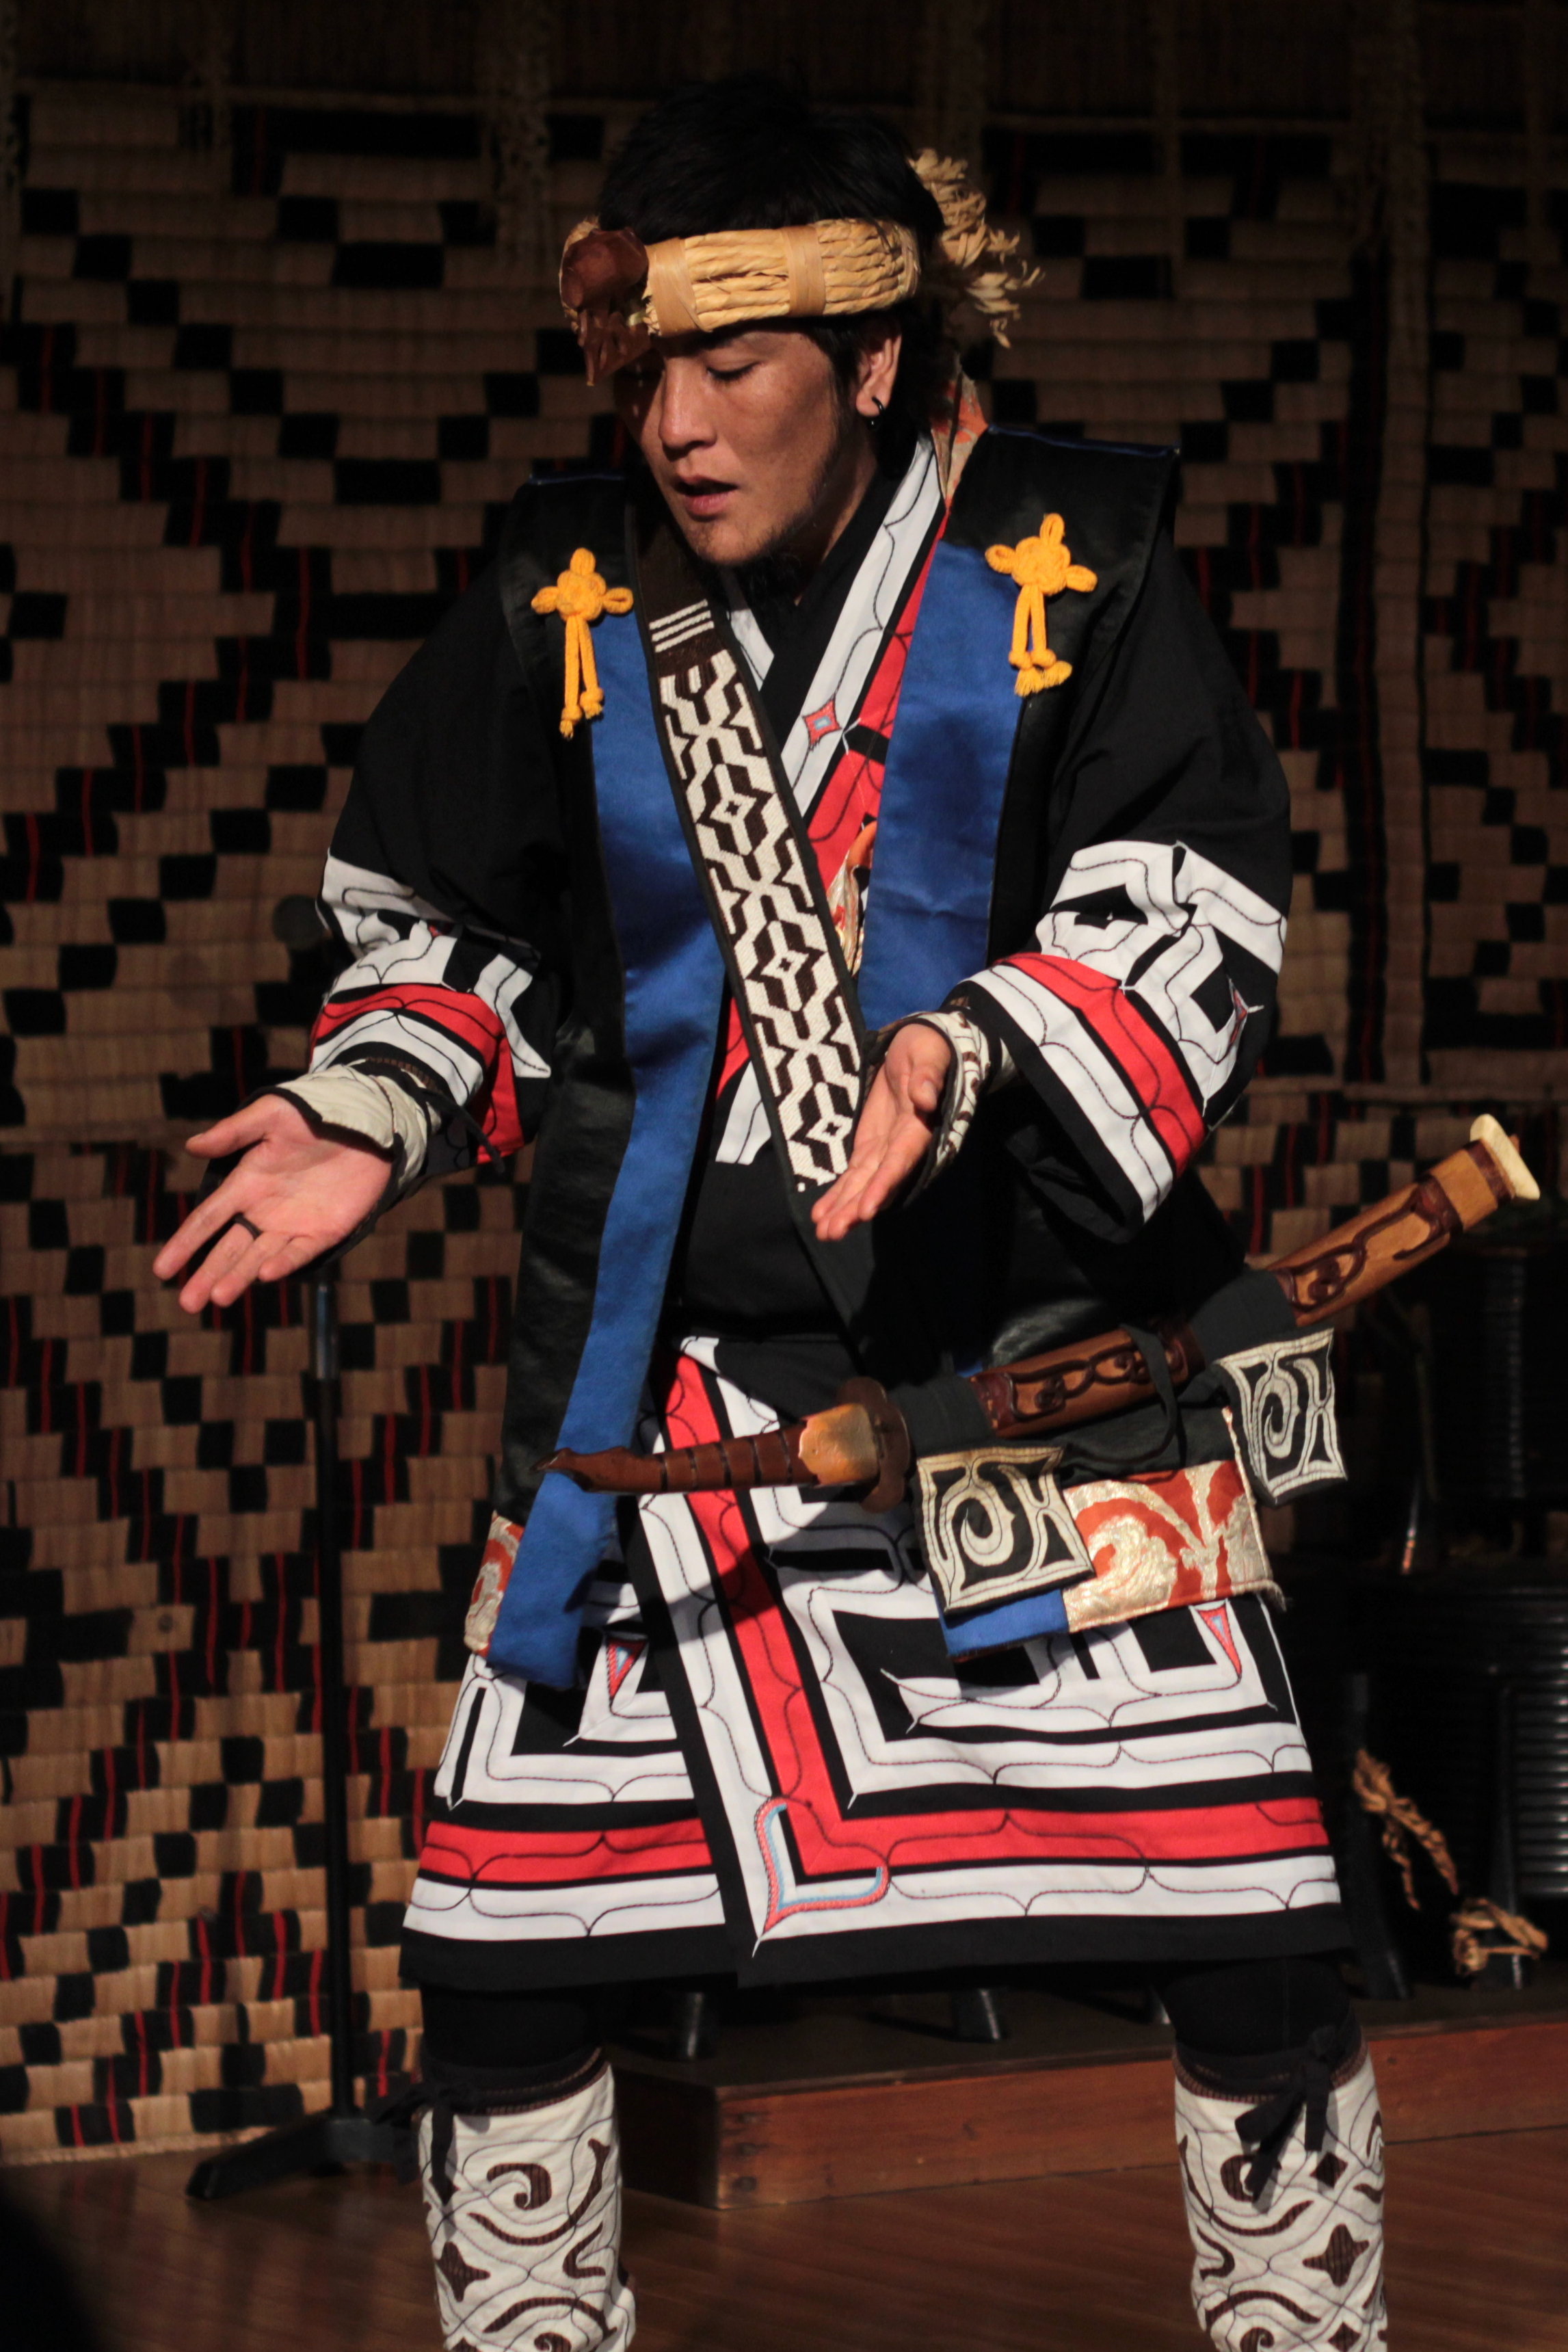 Ainu Man Performing Traditional Dance in Shiraoi, Hokkaido, Japan